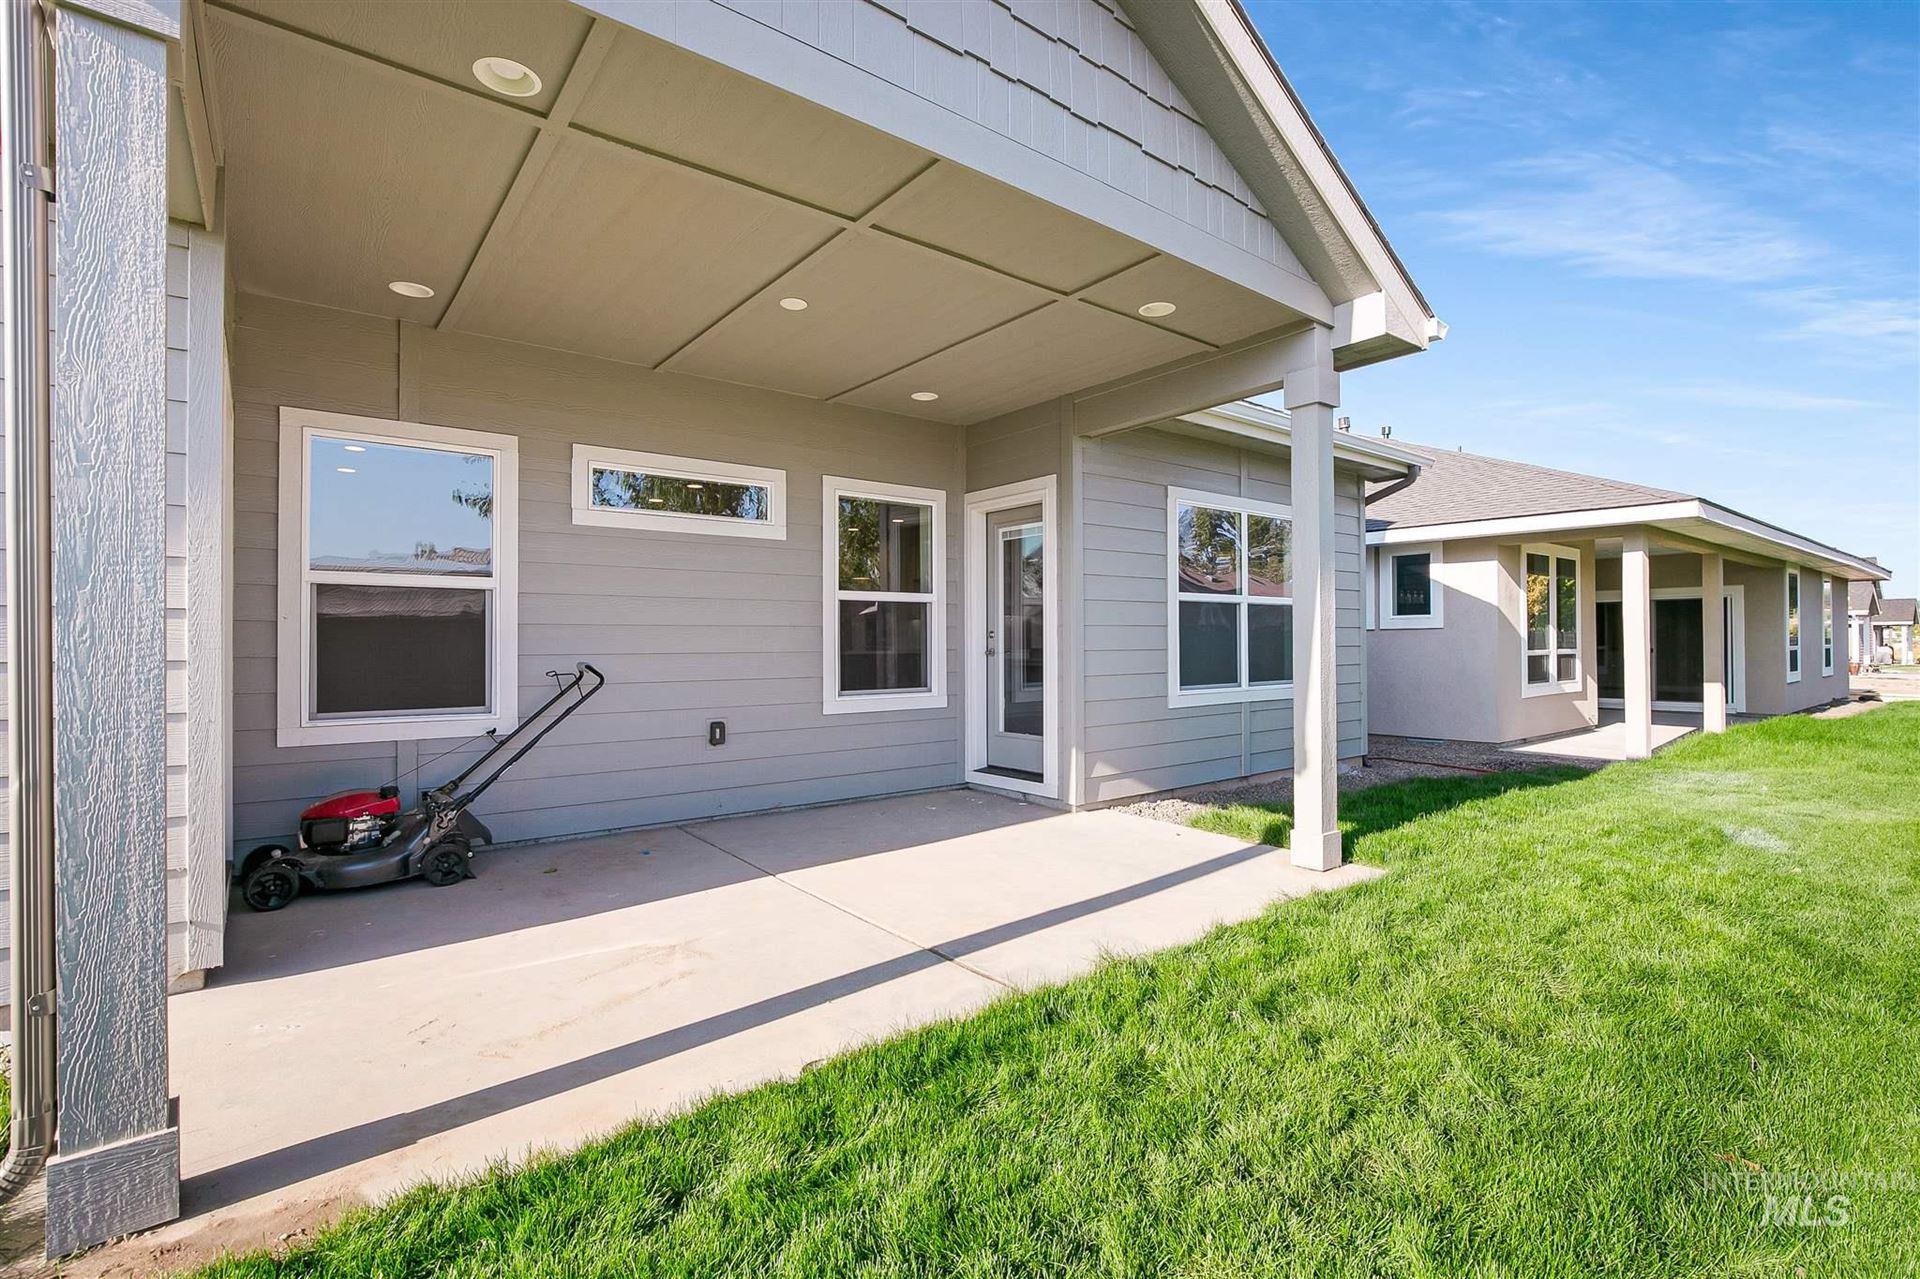 Photo of 3908 E Park Ridge Drive, Nampa, ID 83687 (MLS # 98786764)